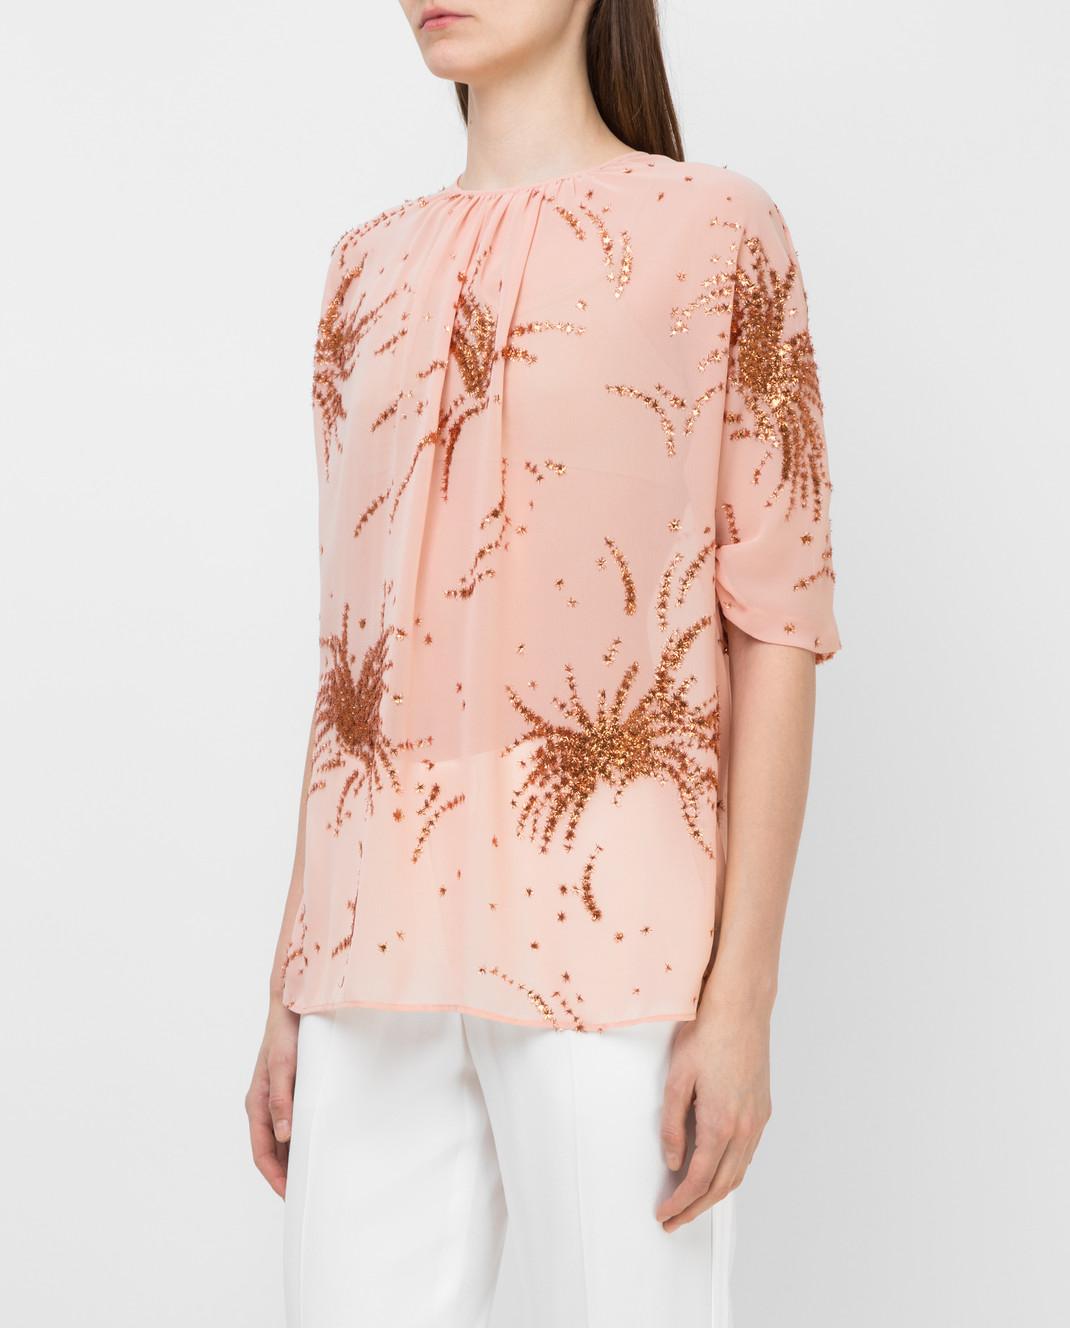 Miu Miu Пудровая блуза MT1296 изображение 3